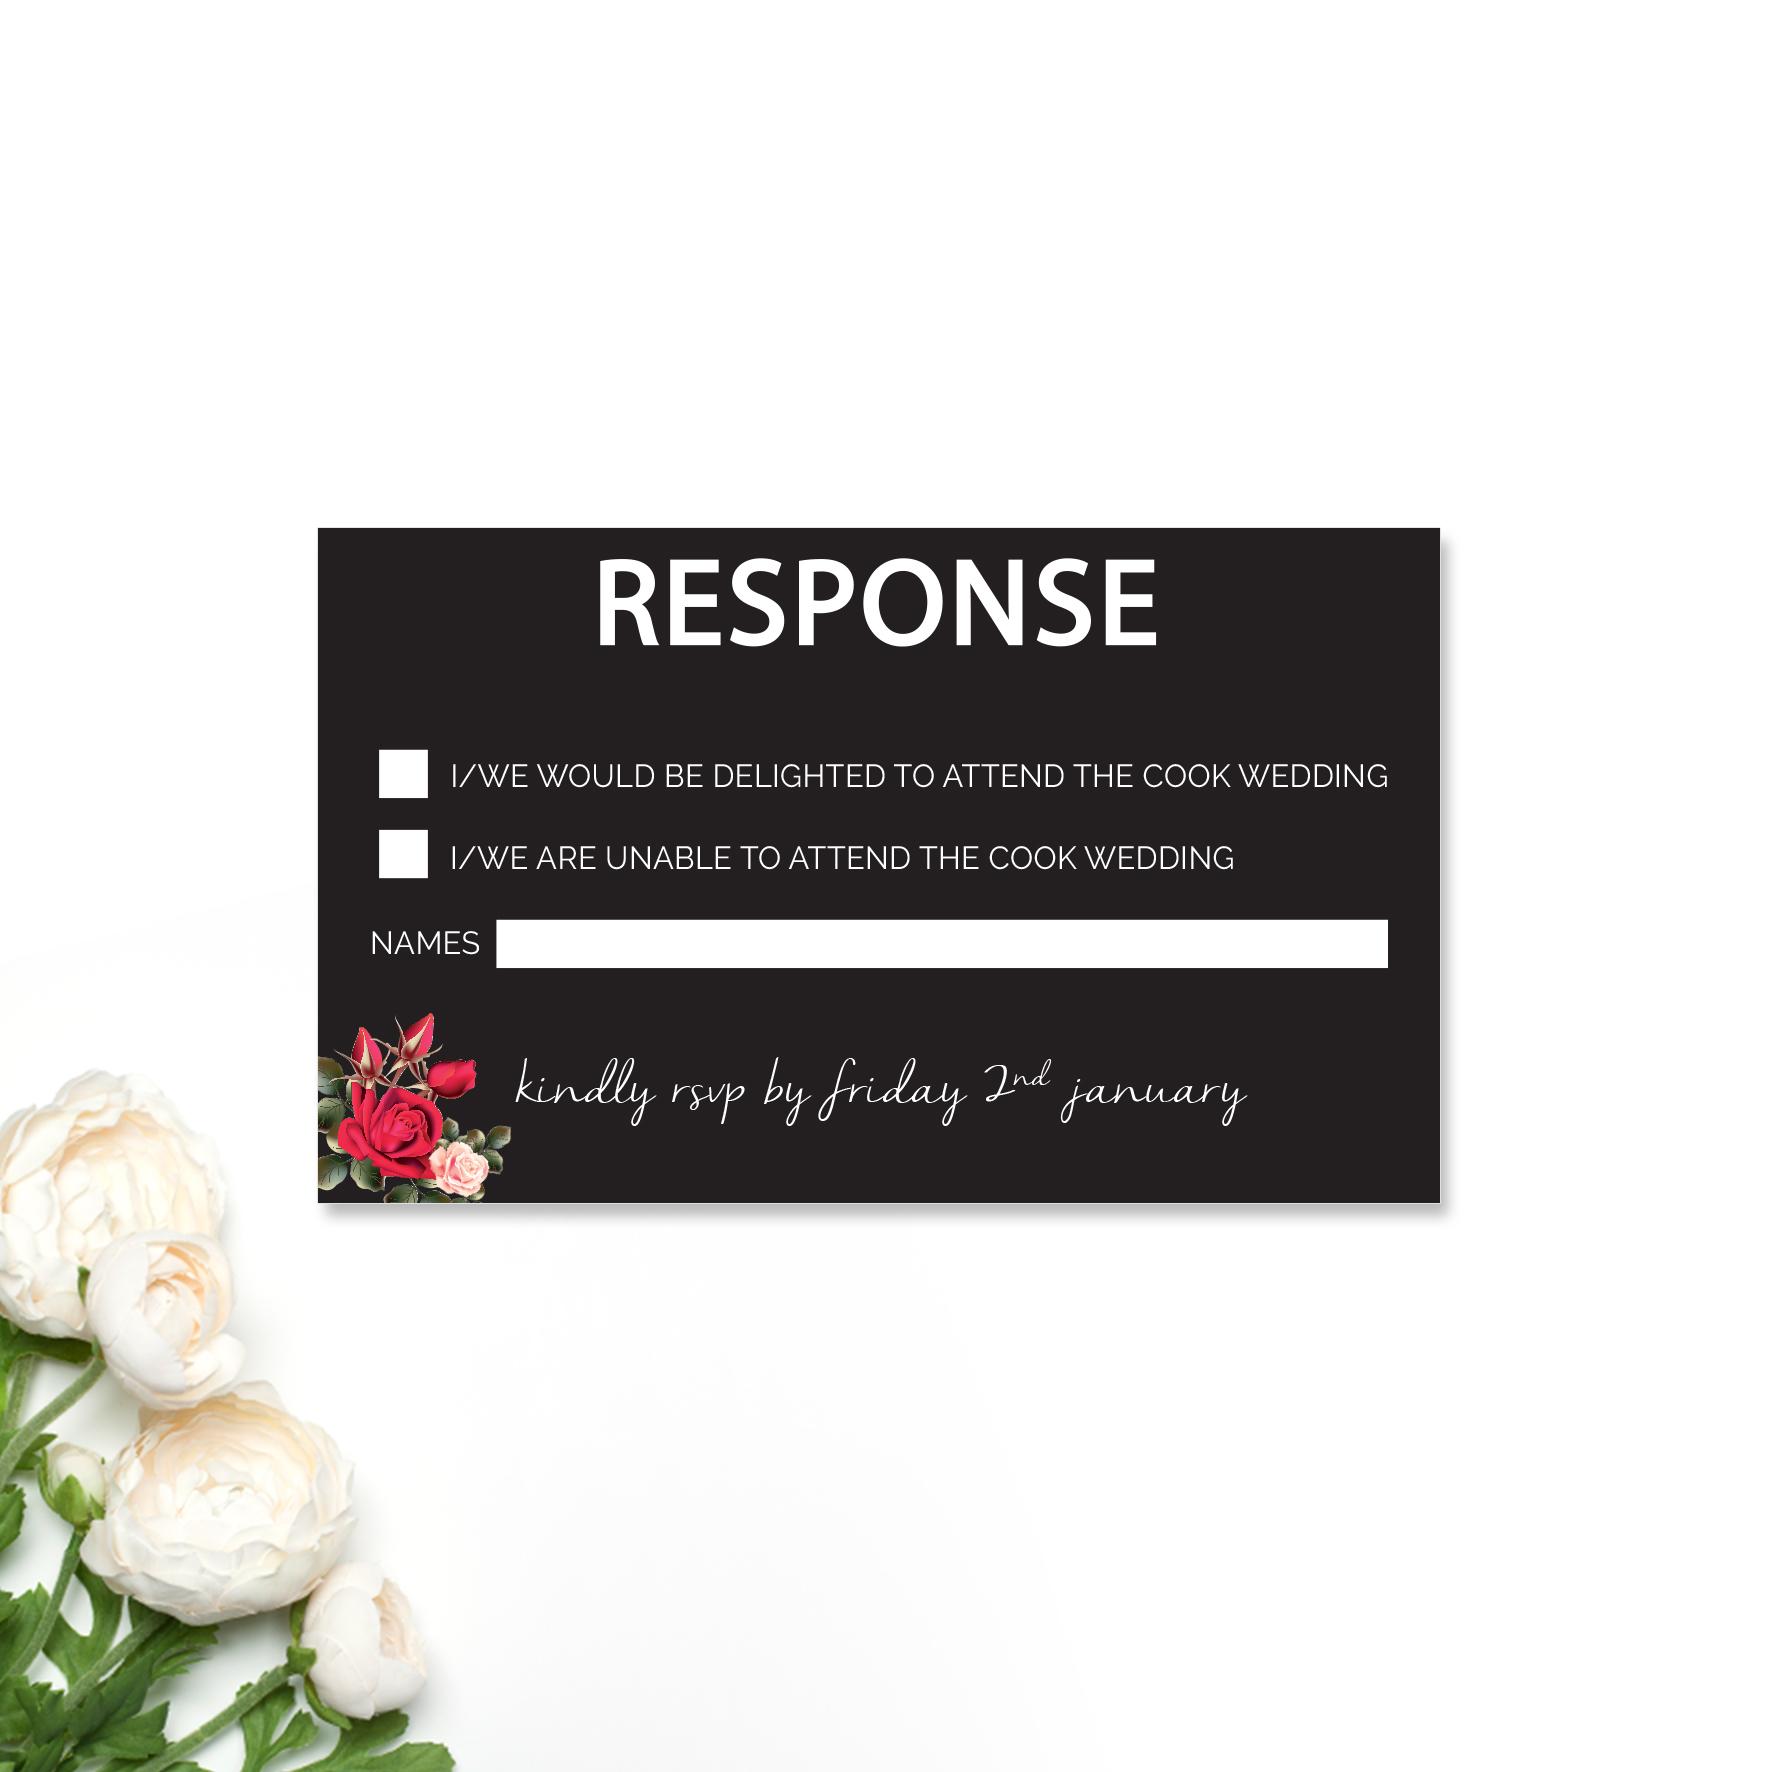 Louise + Simon Reply Card